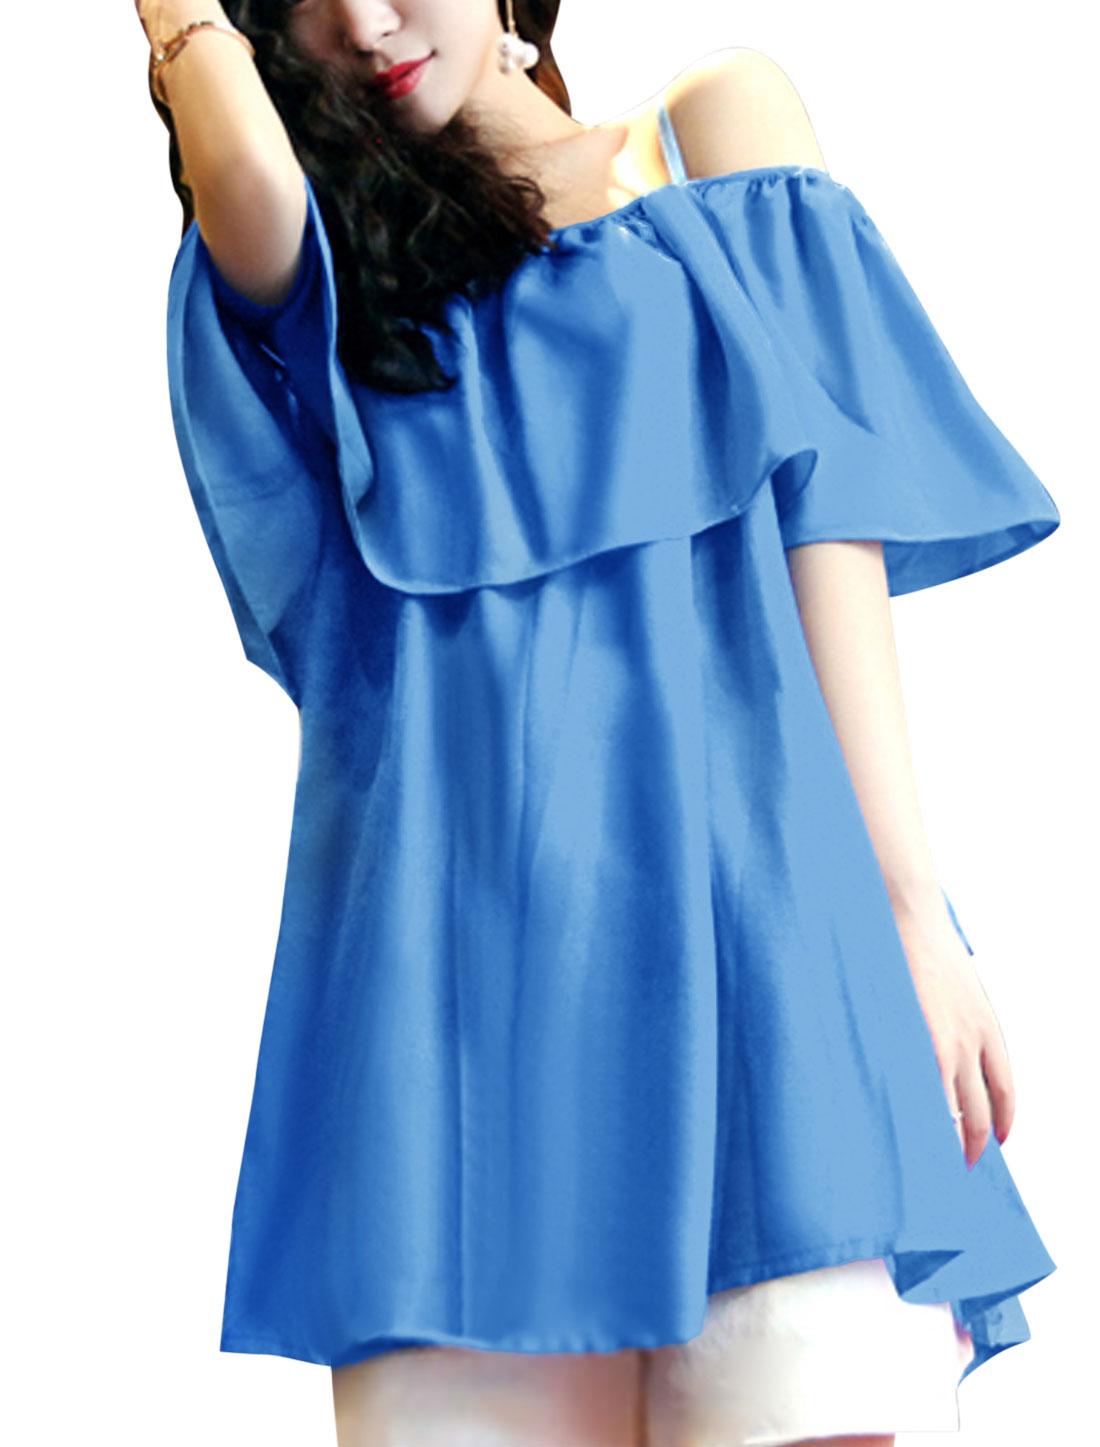 Lady Summer Spaghetti Strap Drawstring Waist Flouncing Tunic Top Blue L